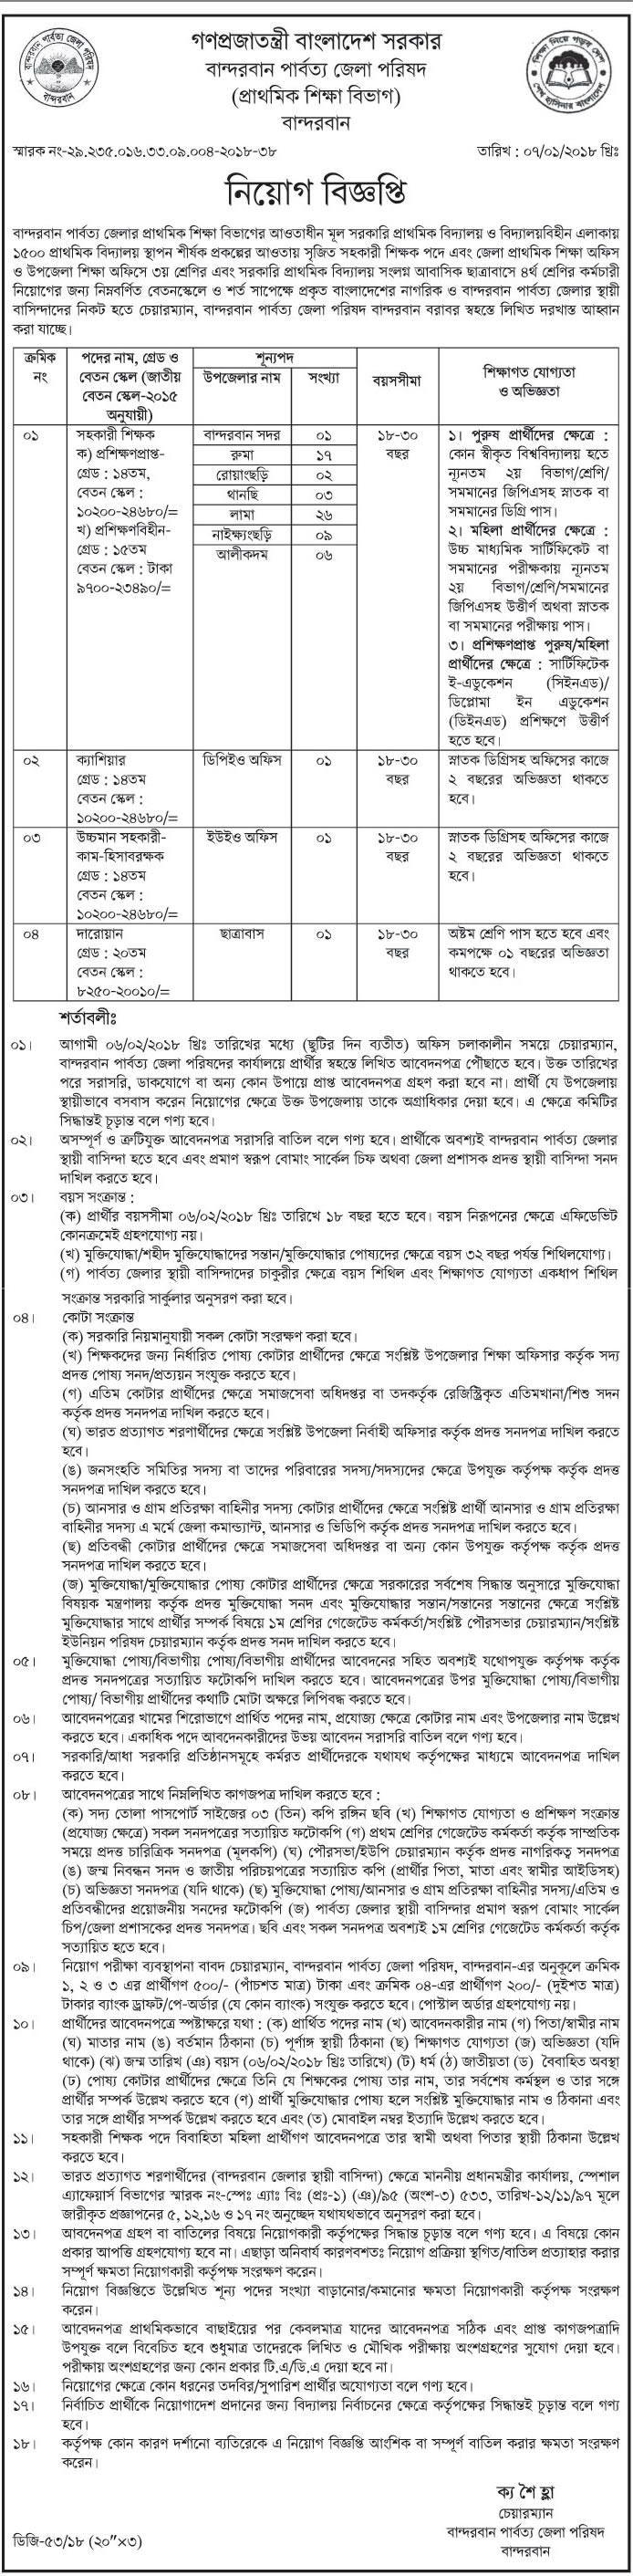 Primary School Assistant Teacher Job Circular 2018 - Job Education 24